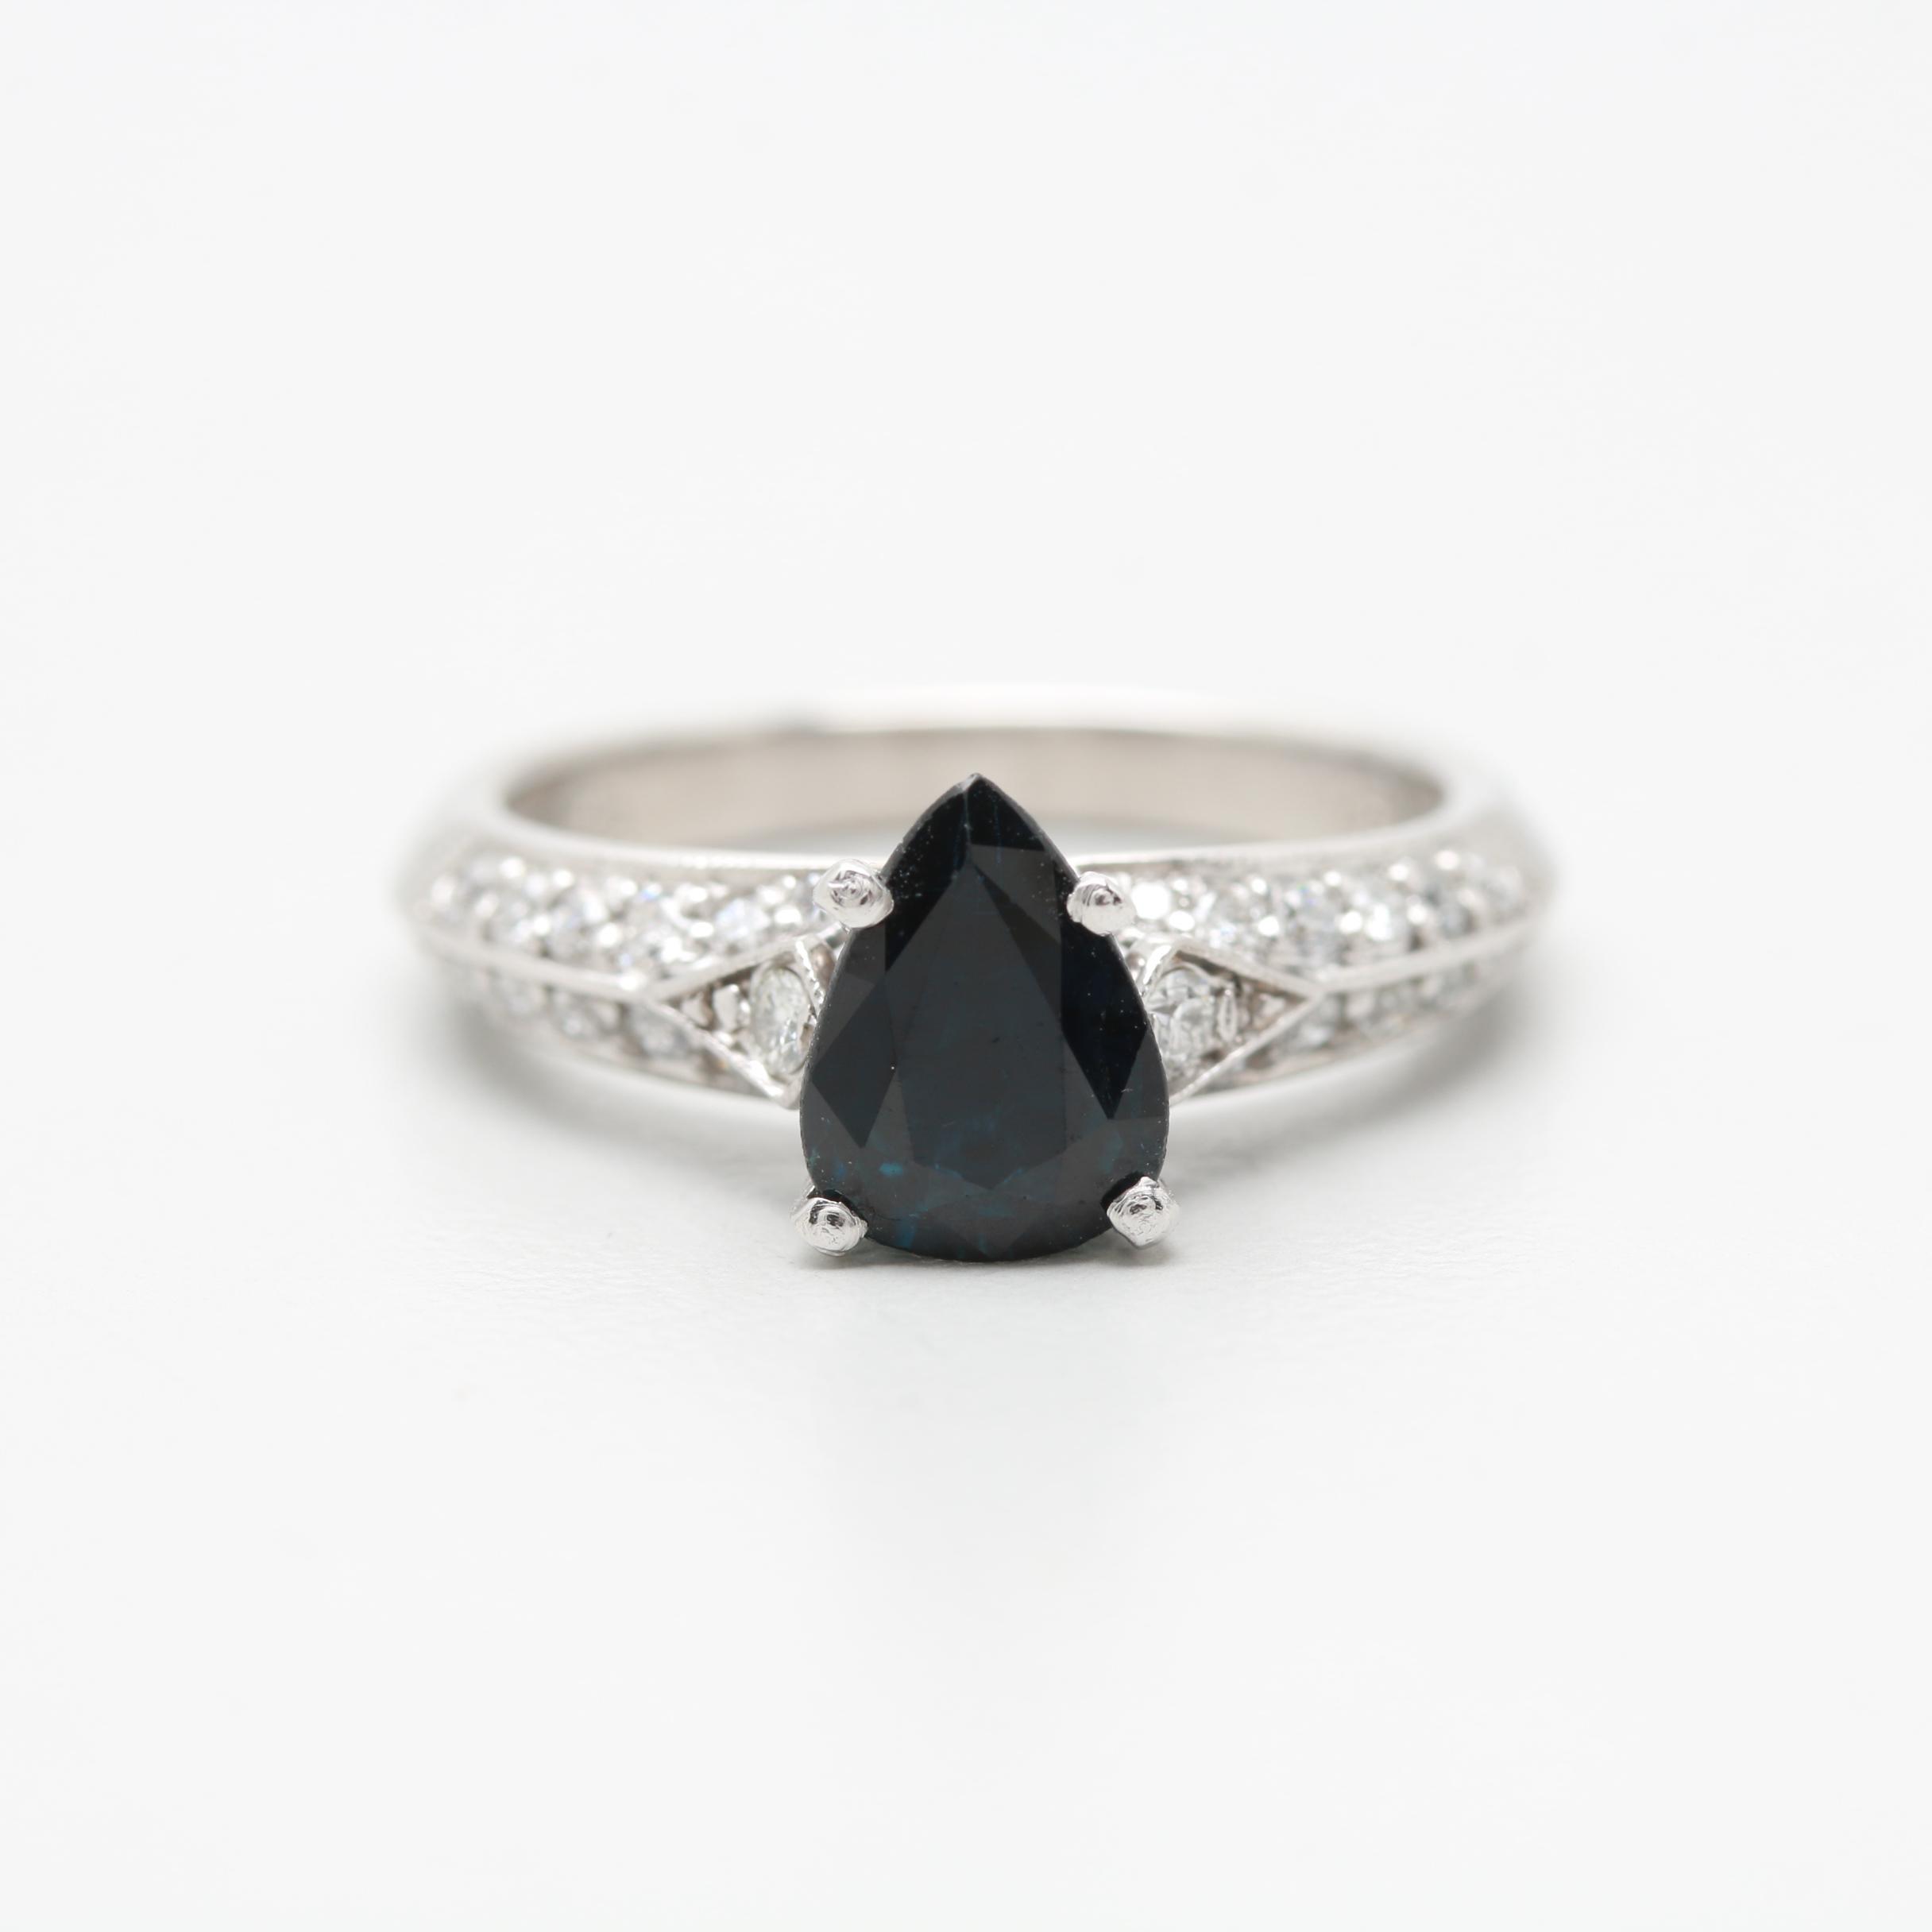 18K White Gold and Platinum 1.34 CT Sapphire and Diamond Ring